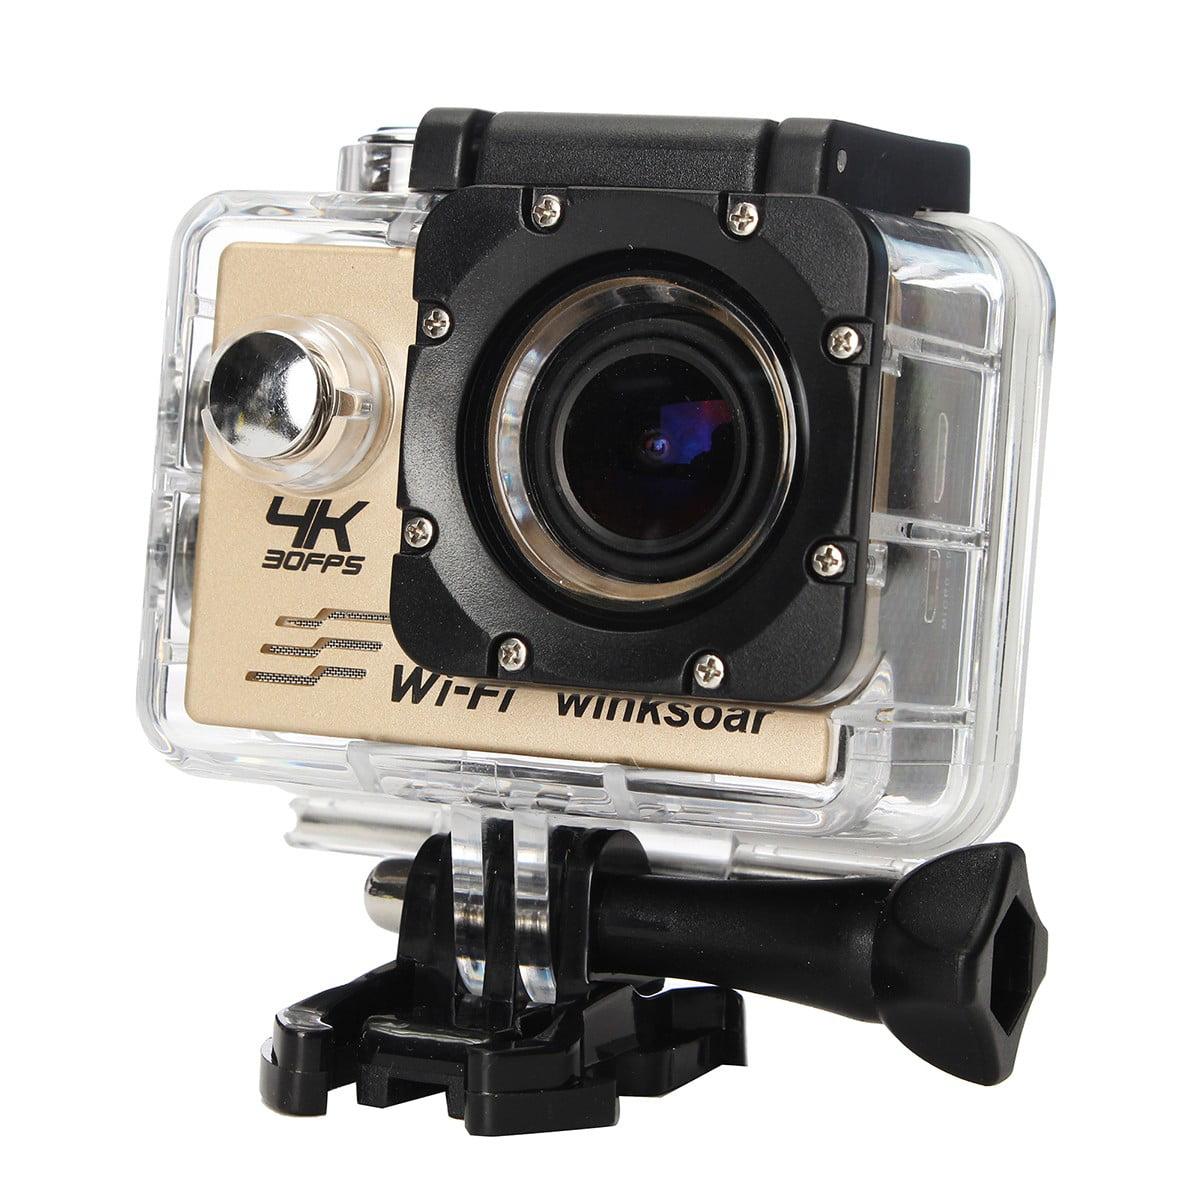 Winksoar SJ9000 Wifi 1080P 4K Ultra HD Sport Action Camera DVR Cam Camcorder Waterproof Christmas Gifts